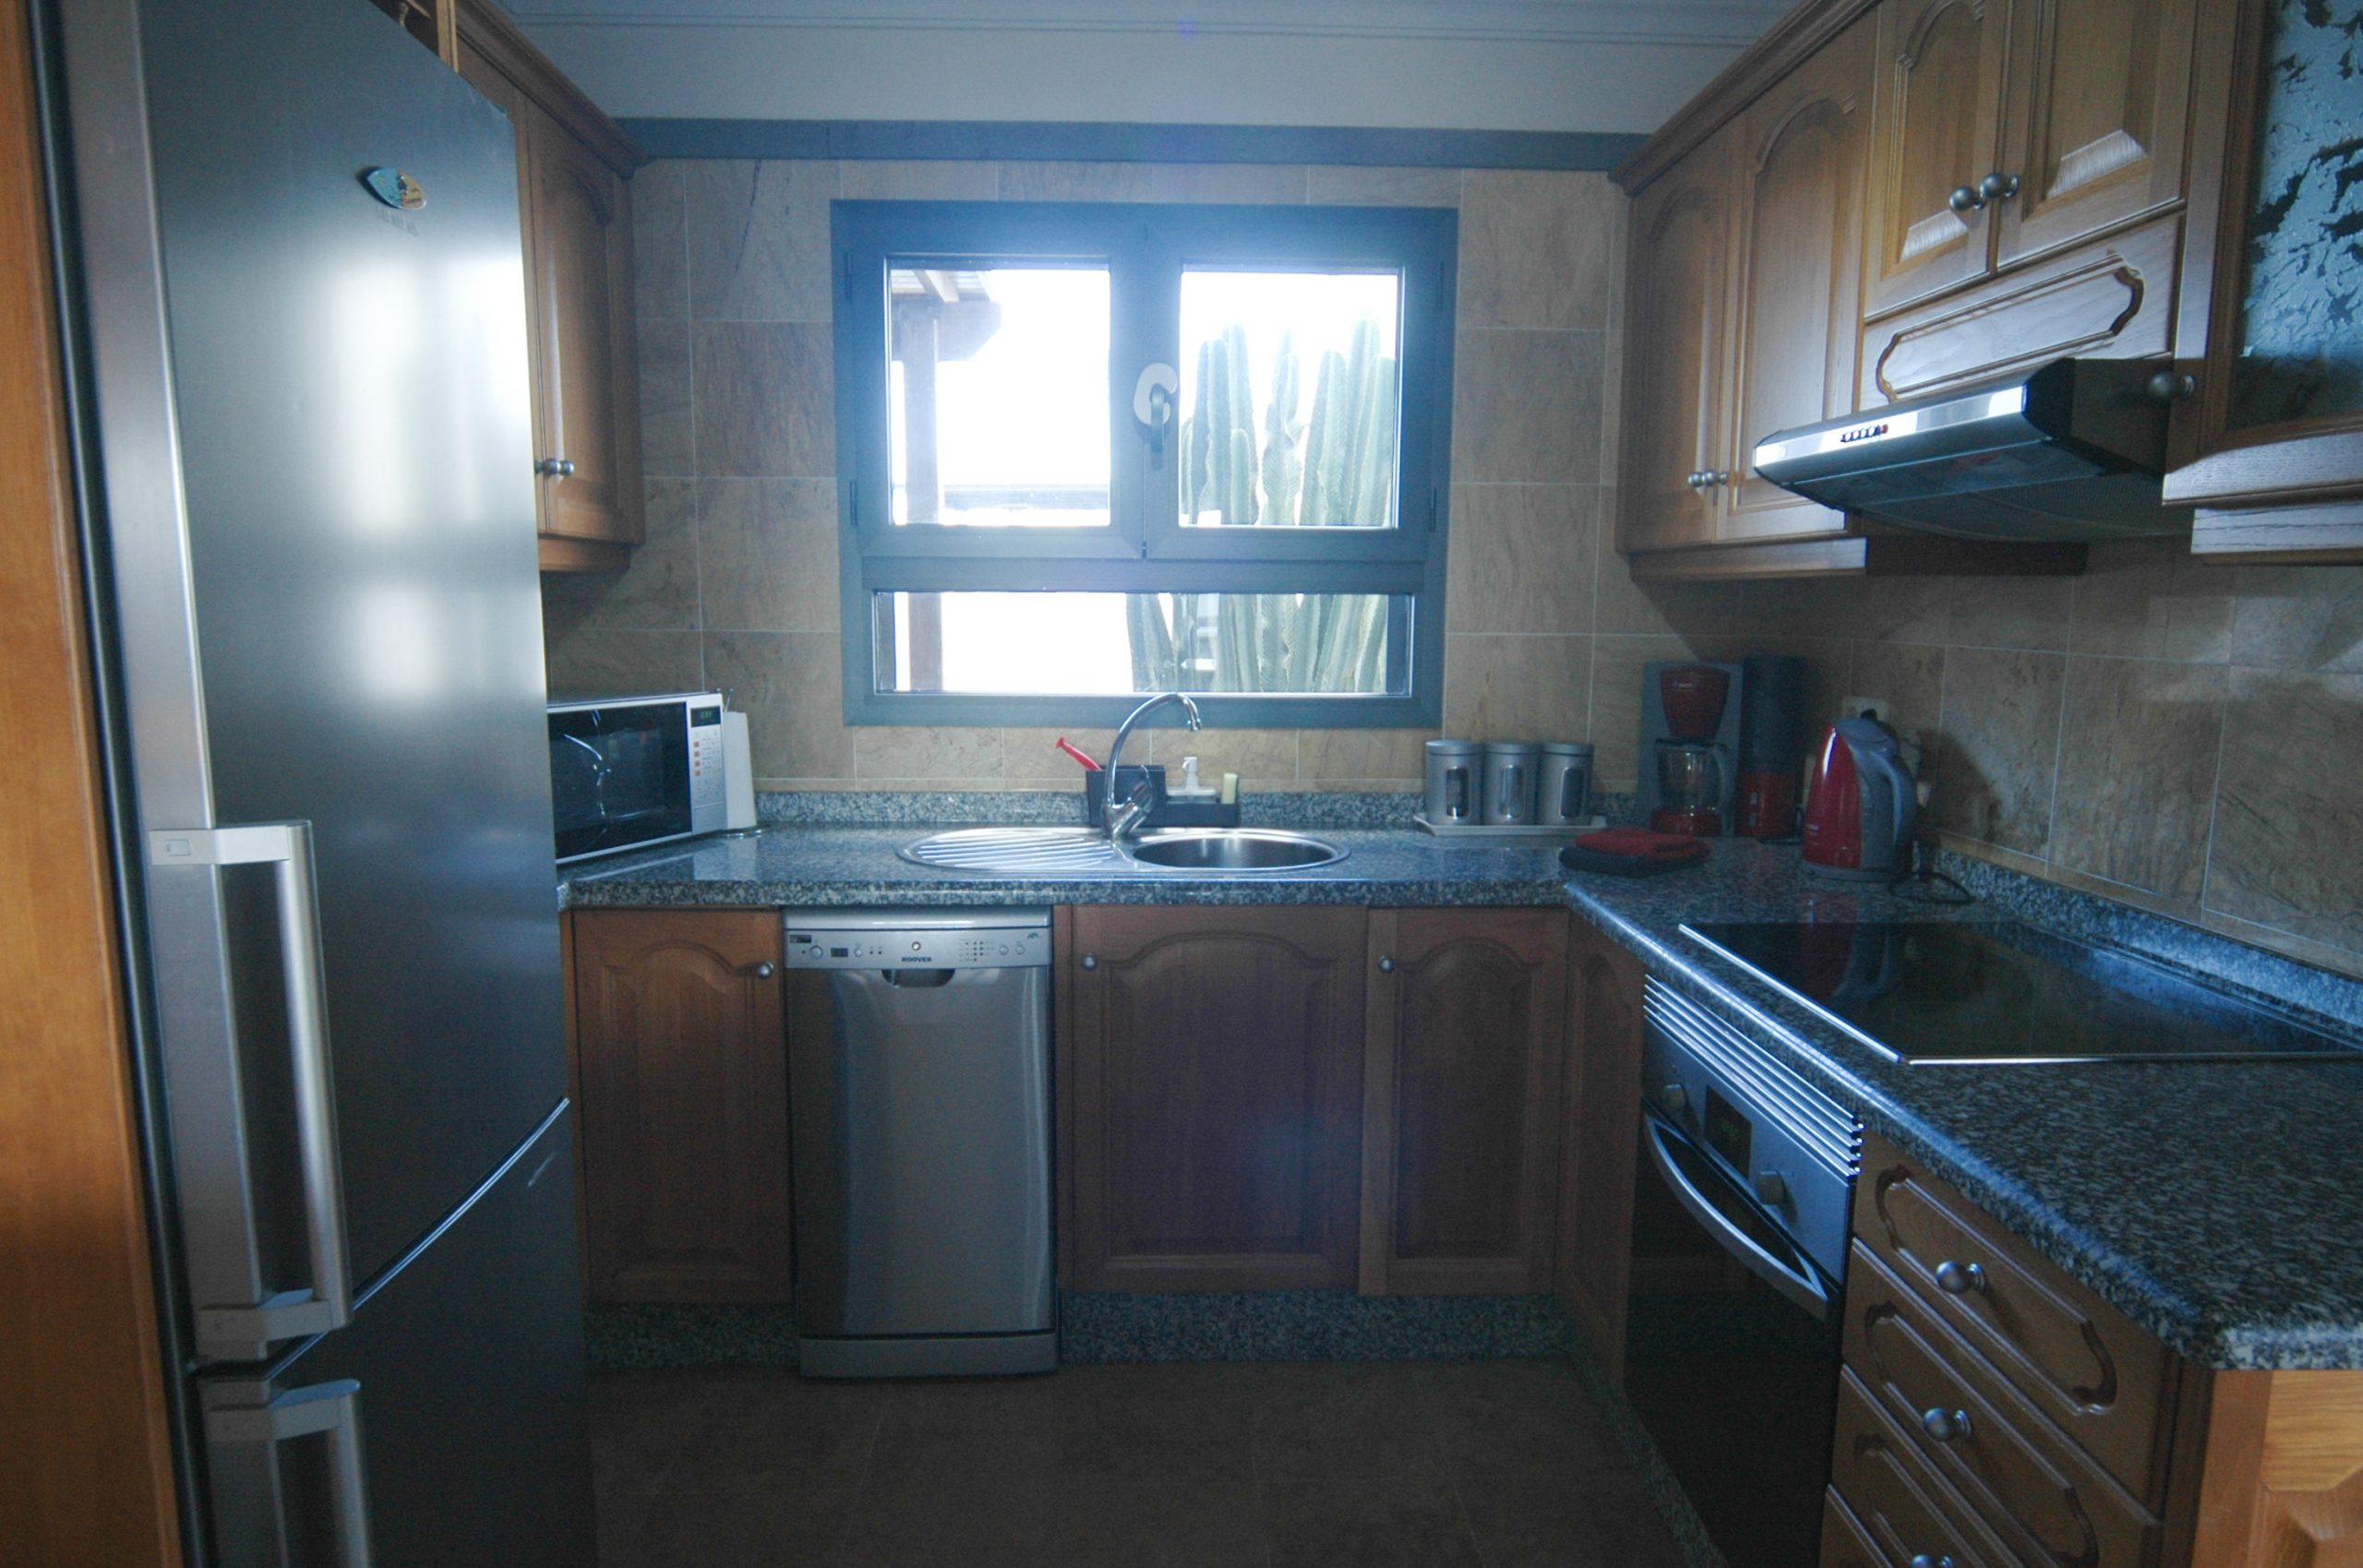 Villa_LVC338912 - Playa Blanca Villa kitchen with dishwasher